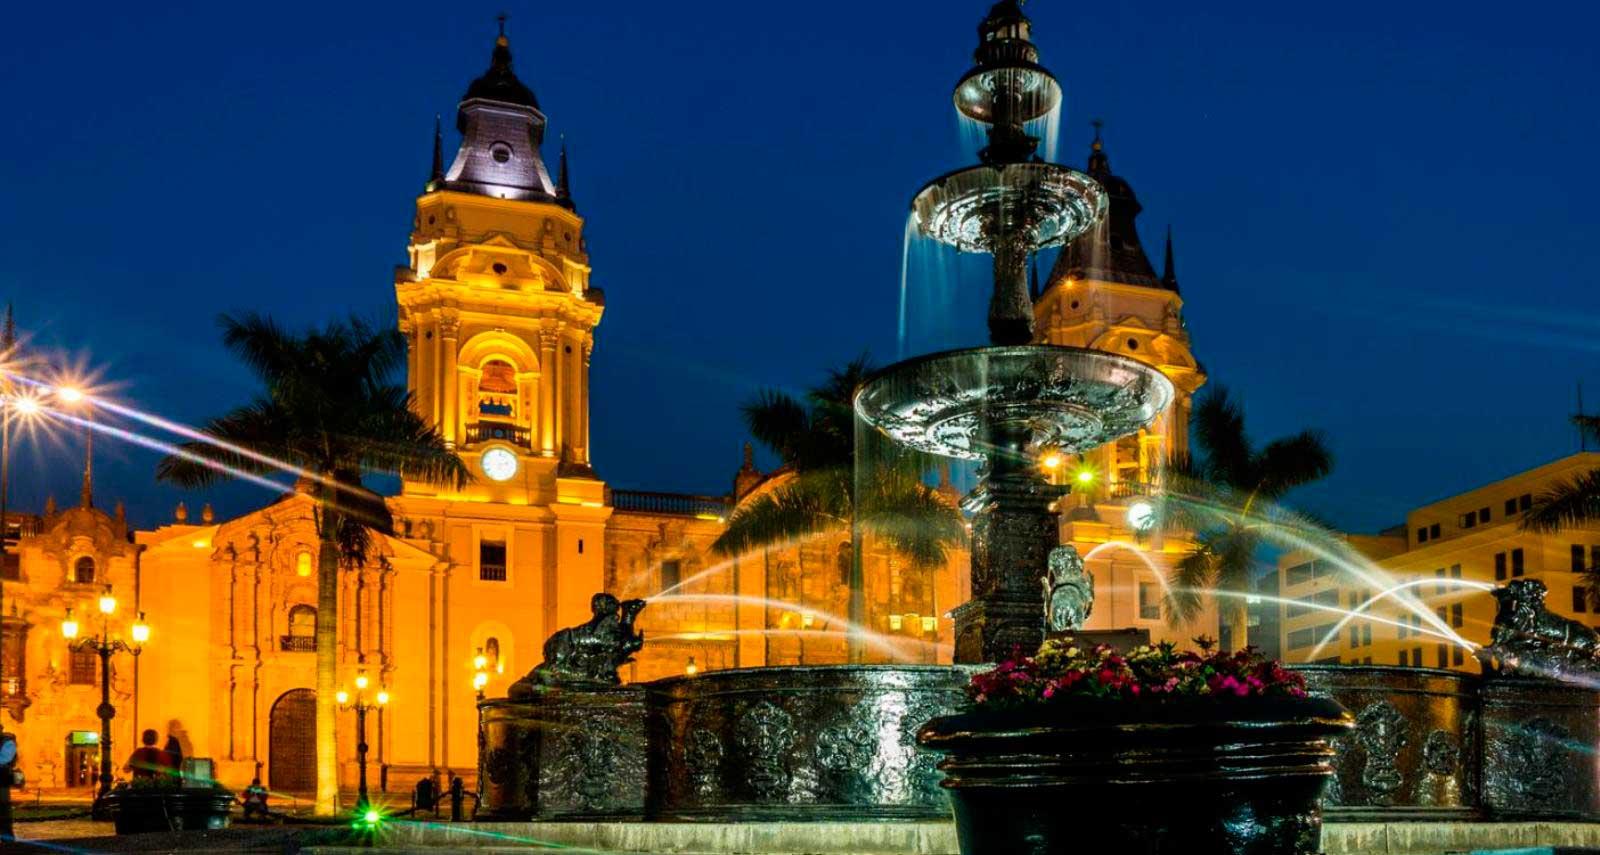 pileta_plaza_armas_lima_peru_turismo